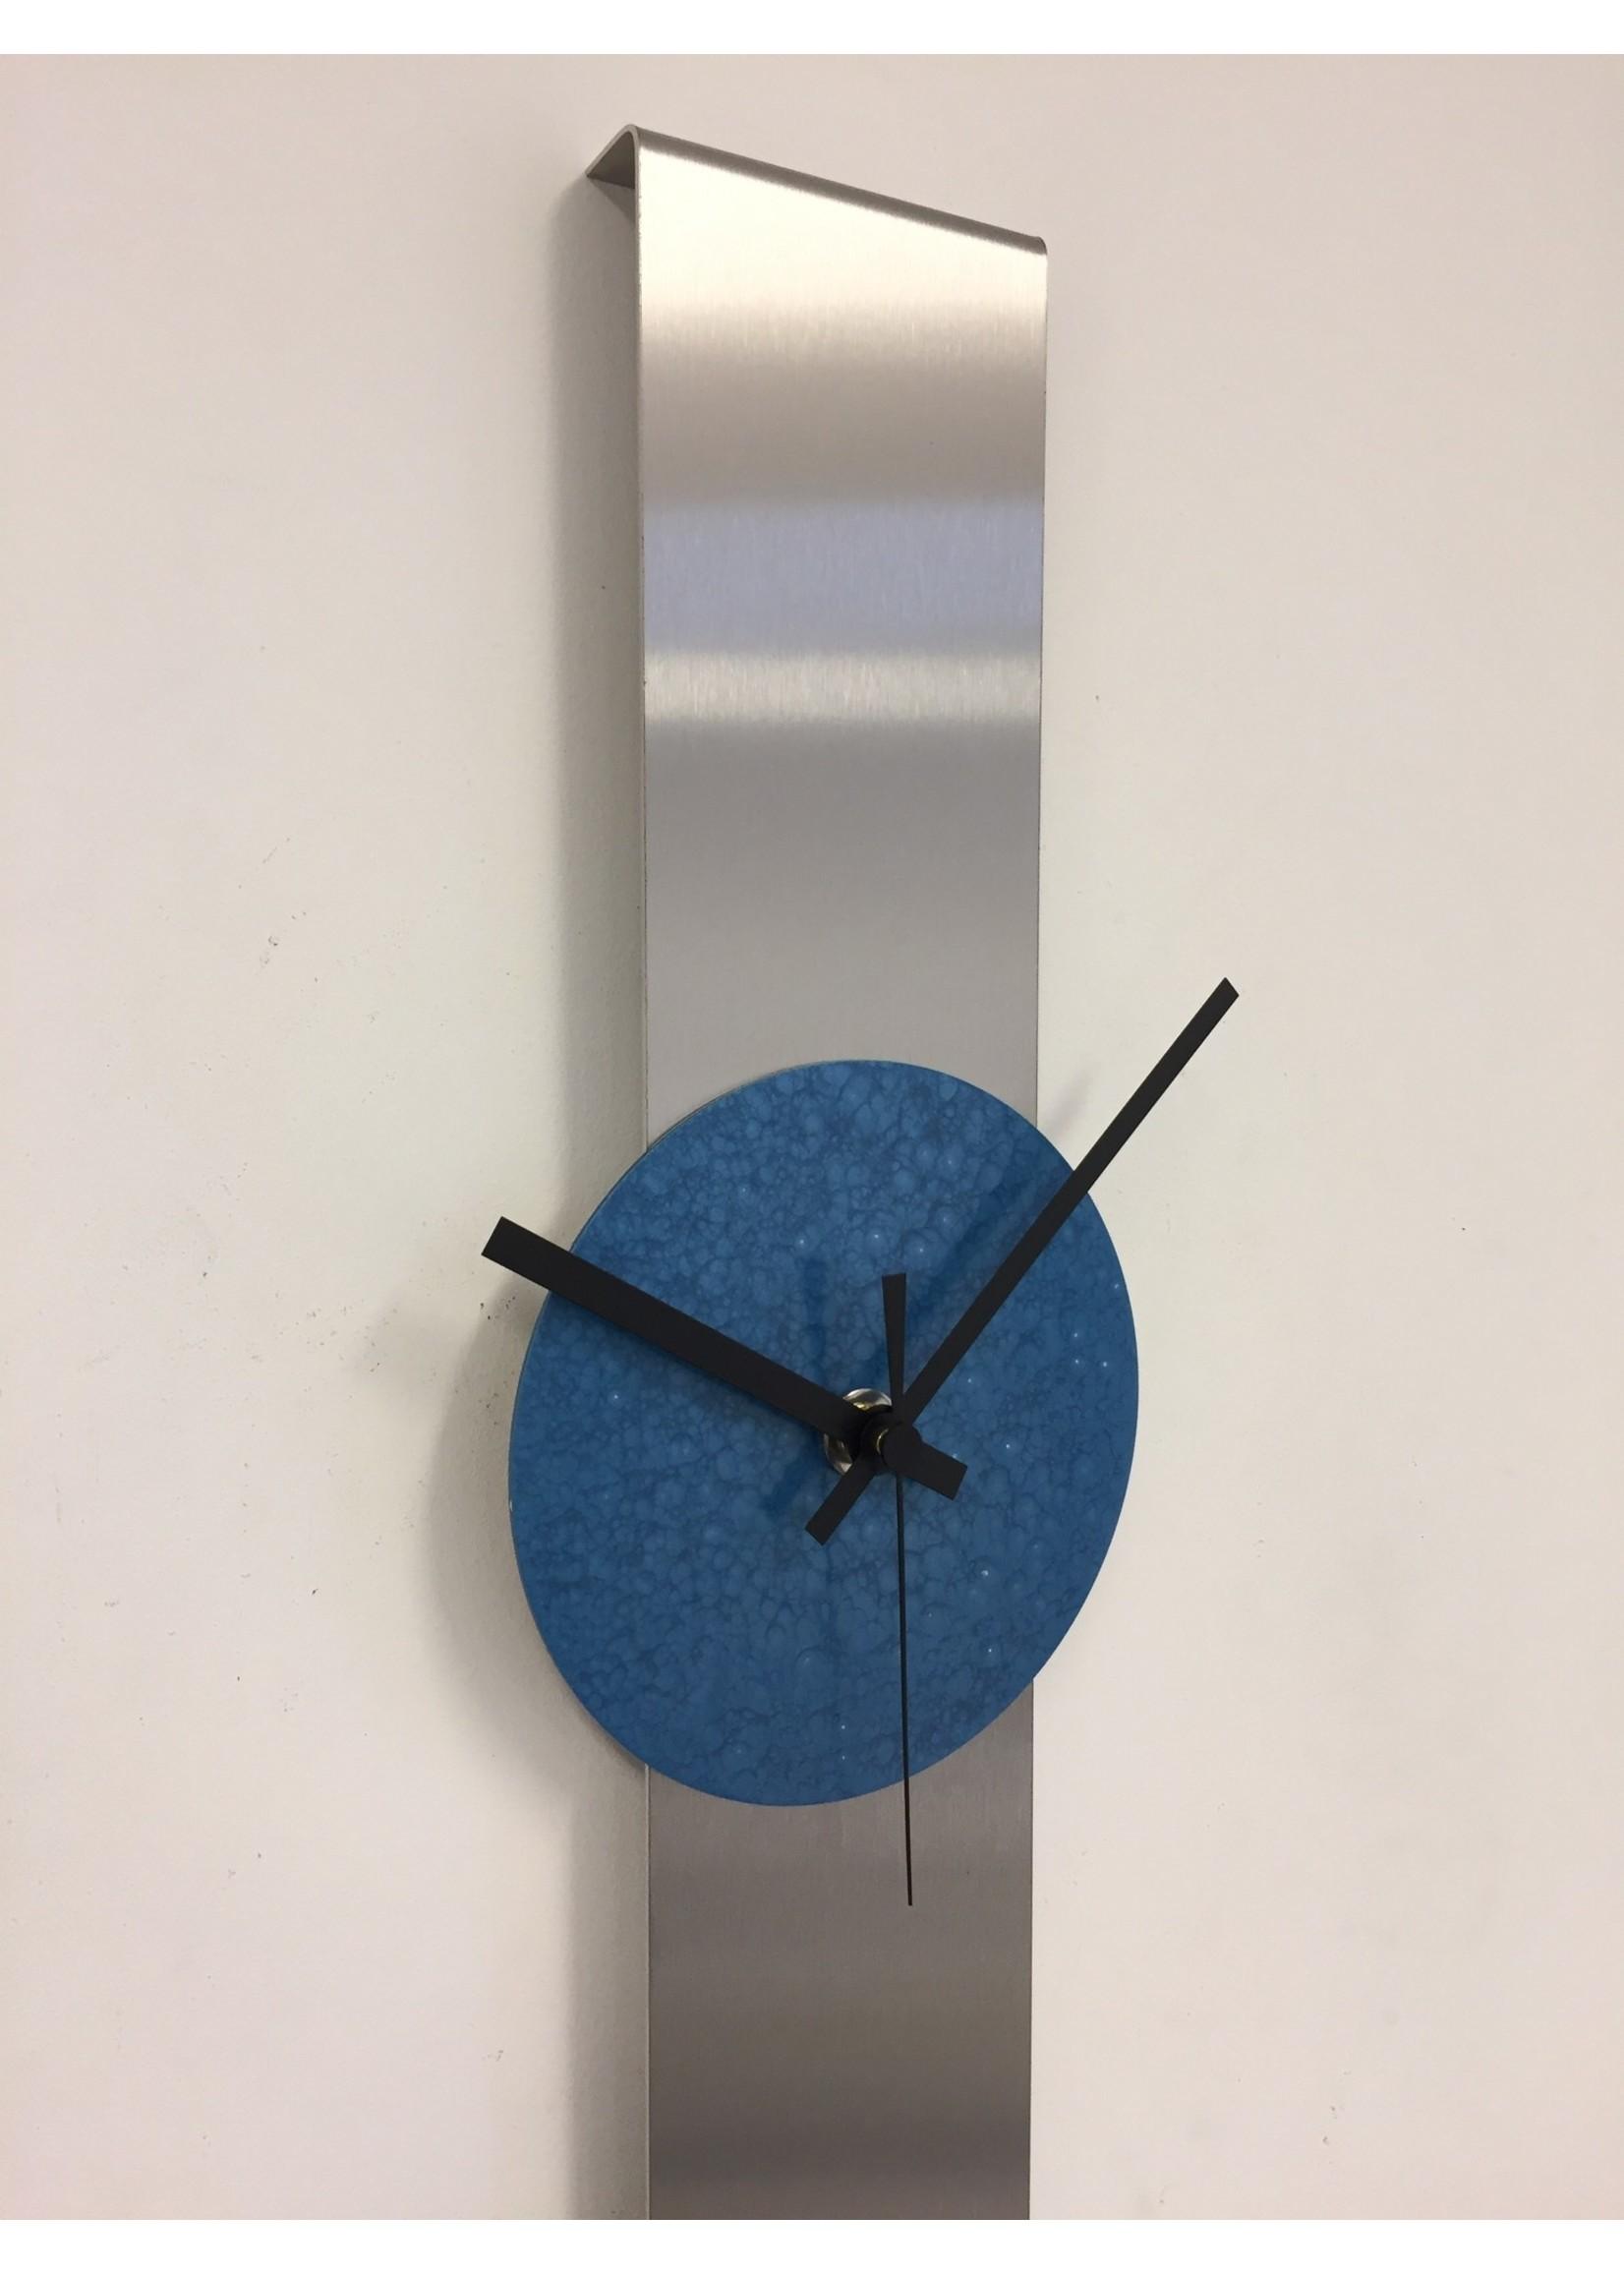 Klokkendiscounter Wandklok SUMMIT MODERN DUTCH DESIGN Blue Hammer